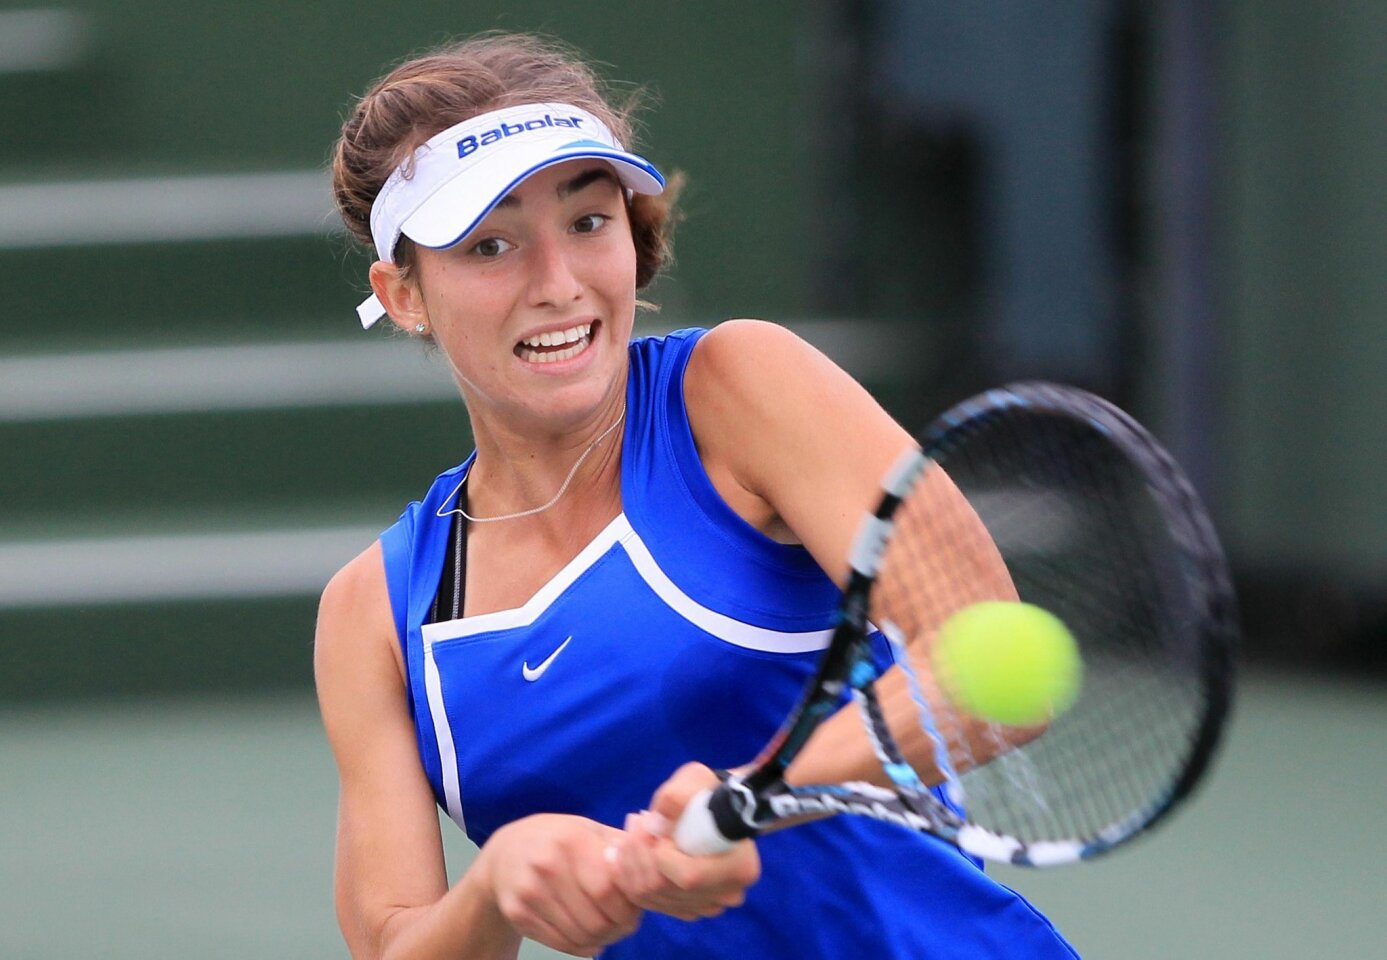 CIF Girls Tennis Championships